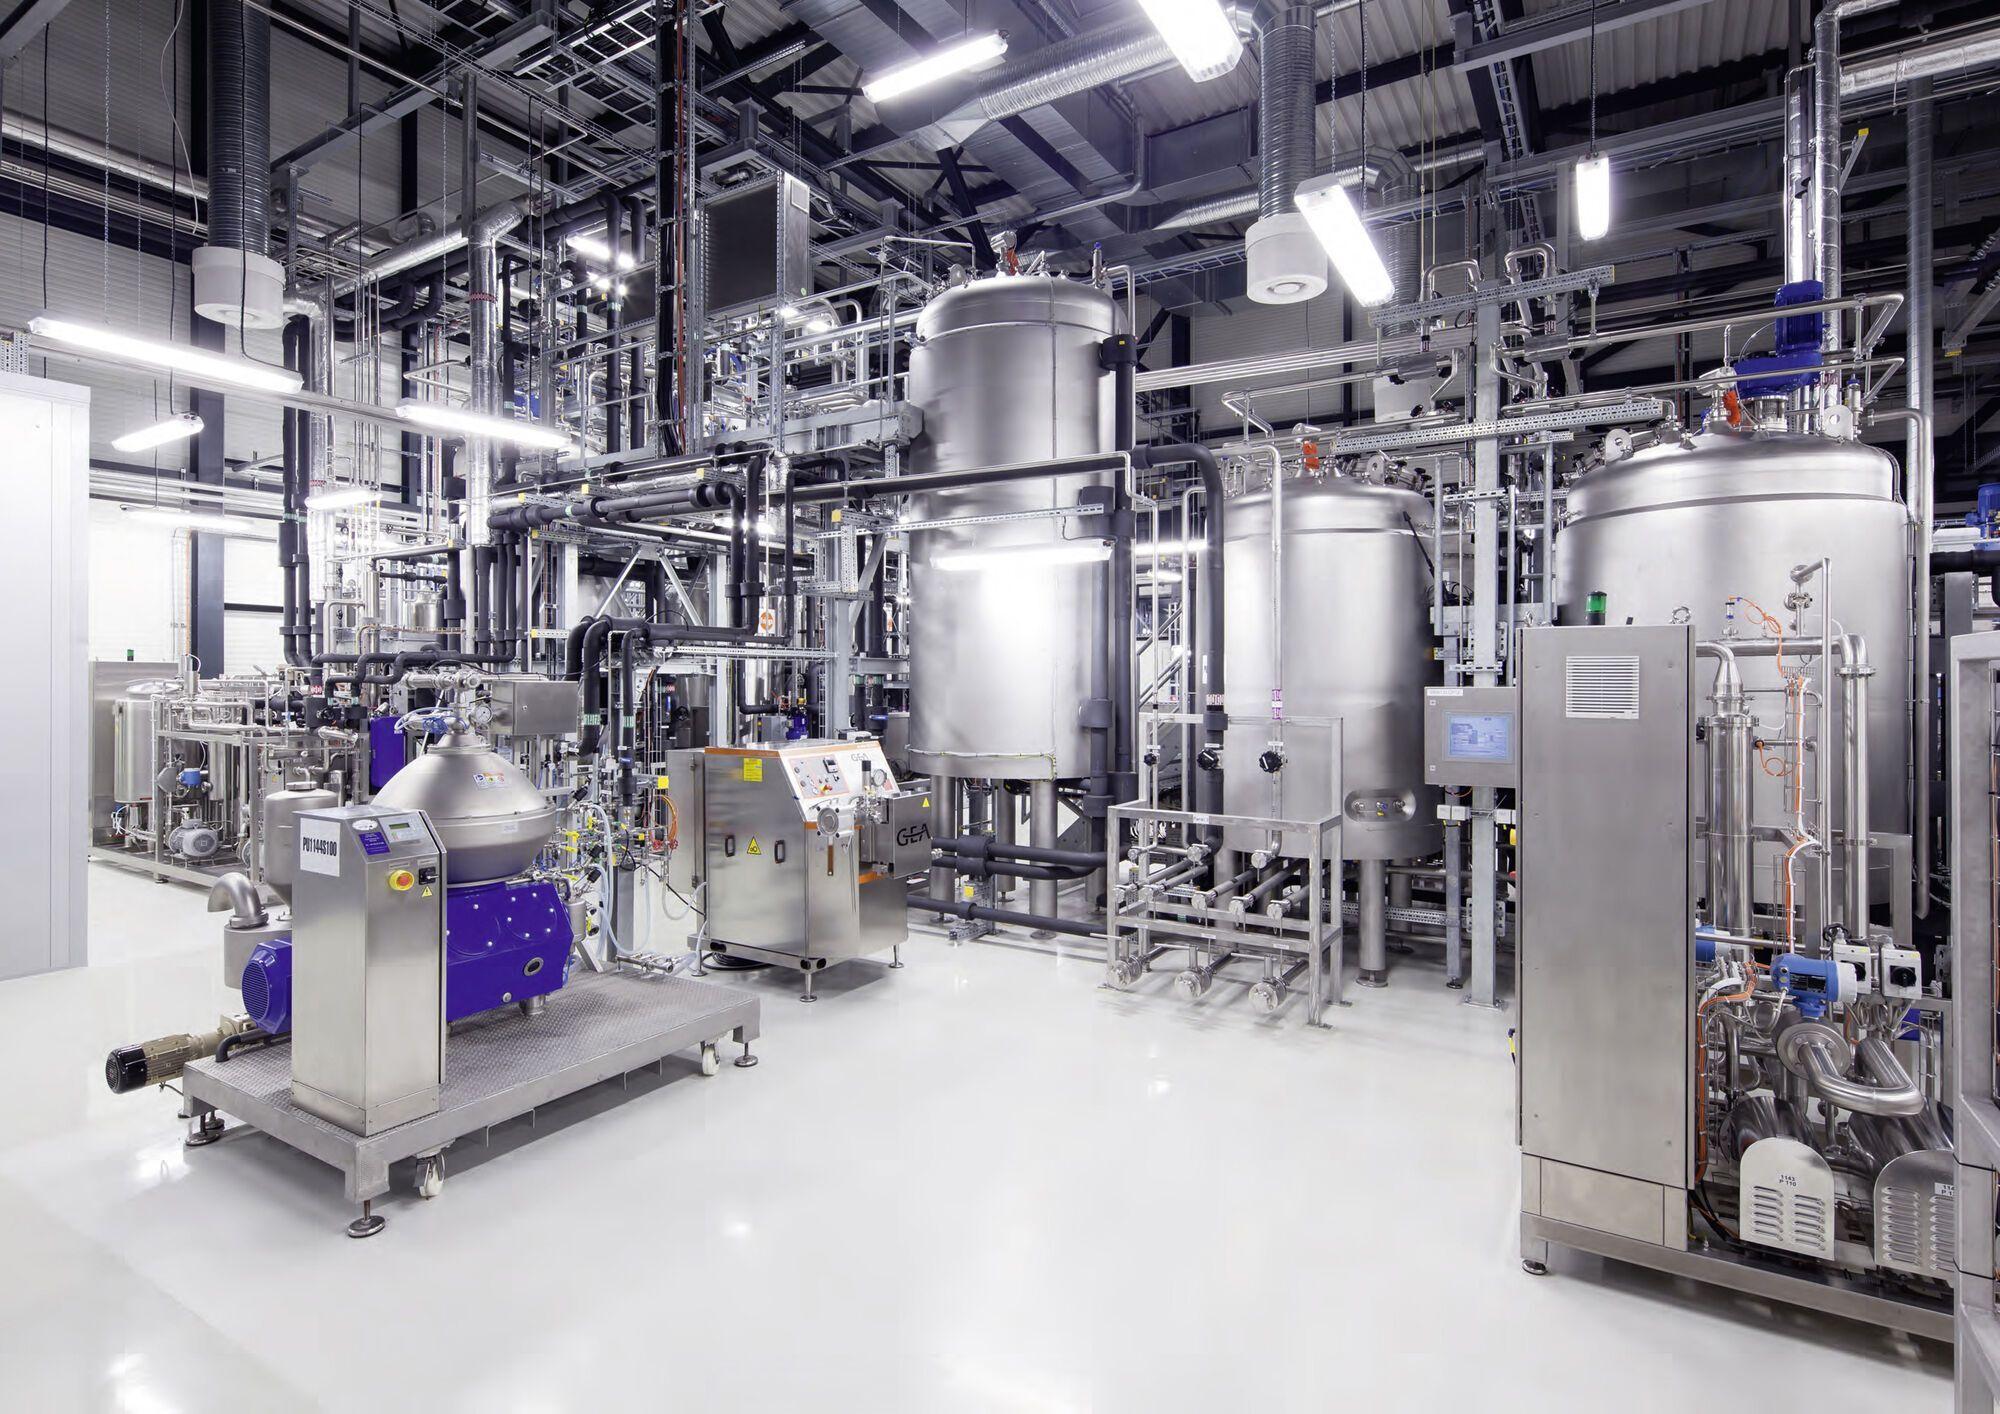 Комплекс по производству синтетического бензина (e-benzin) на заводе компании Global Bioenergies в немецком городе Лойна